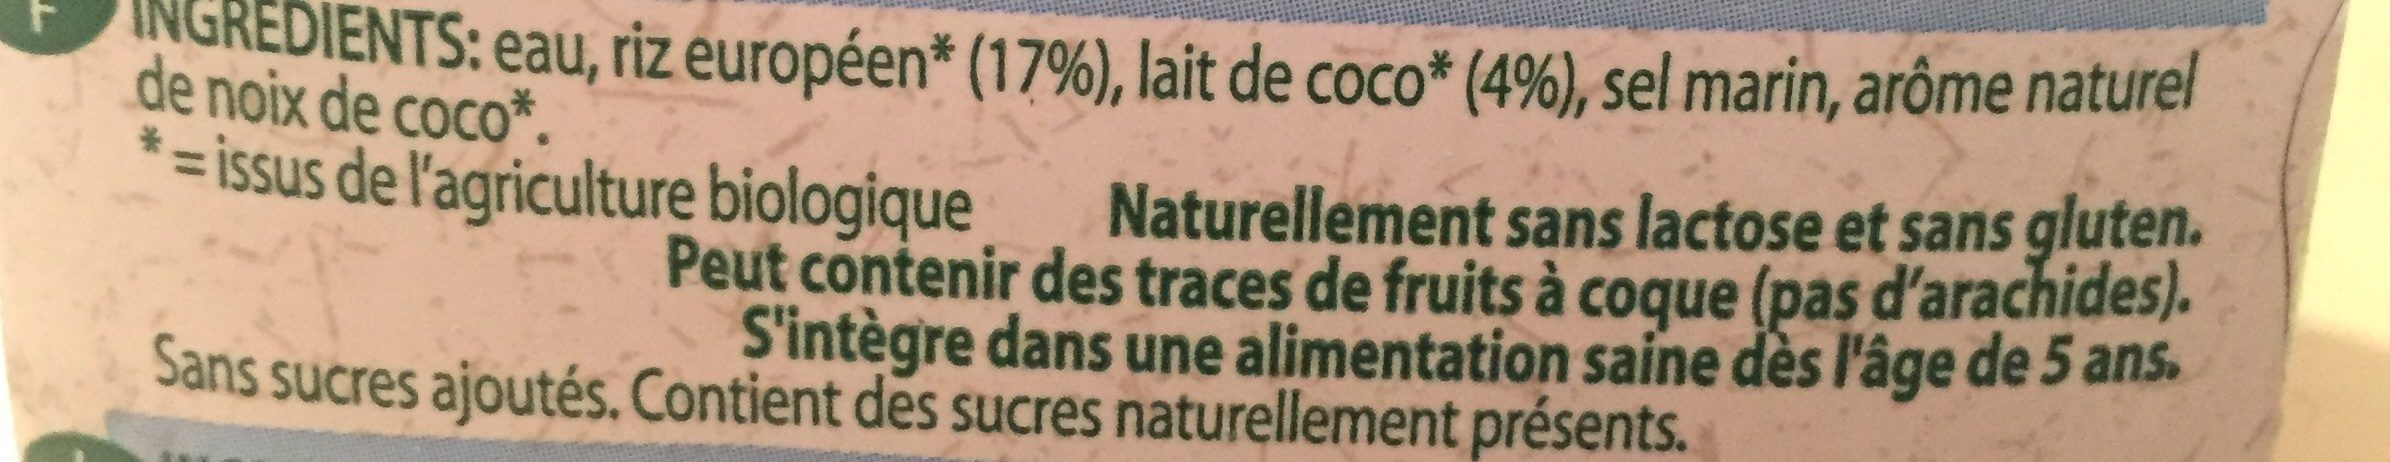 Boisson Au Riz Noix De Coco Bio - 1L - Provamel - Ingredientes